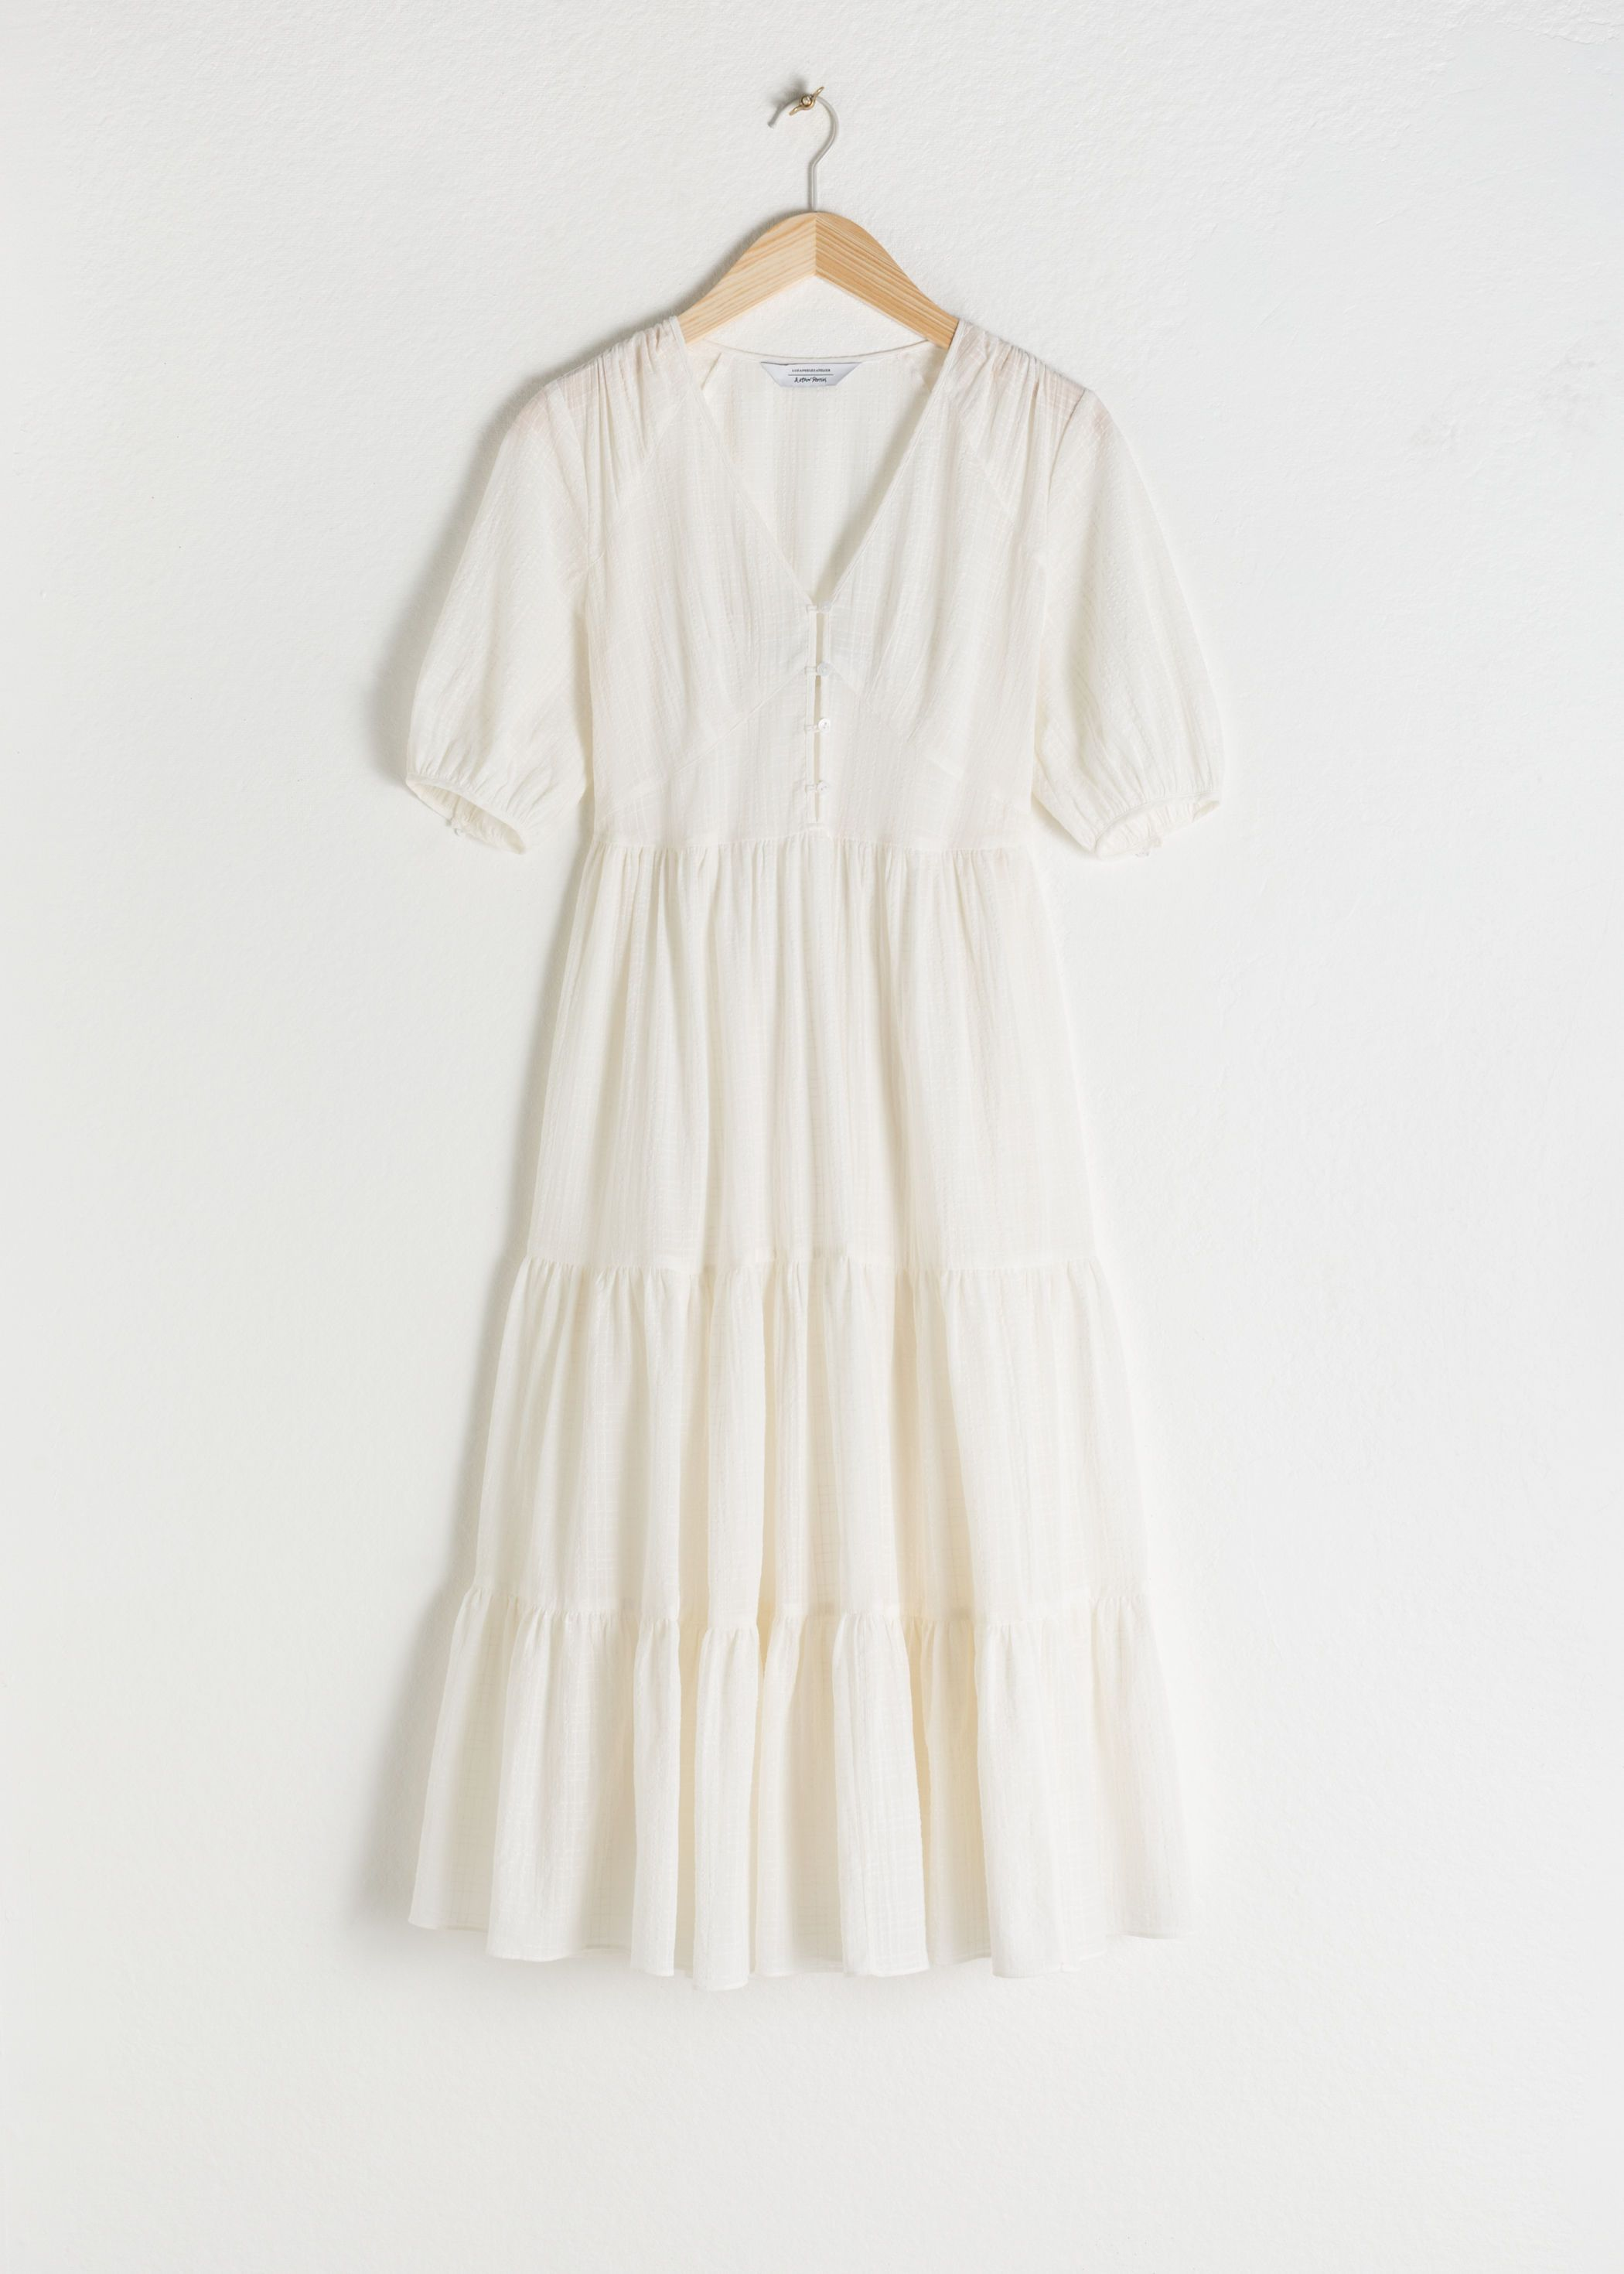 Ruffle Tier Cotton Midi Dress Cotton Midi Dress Dresses White Midi Dress [ 2940 x 2100 Pixel ]